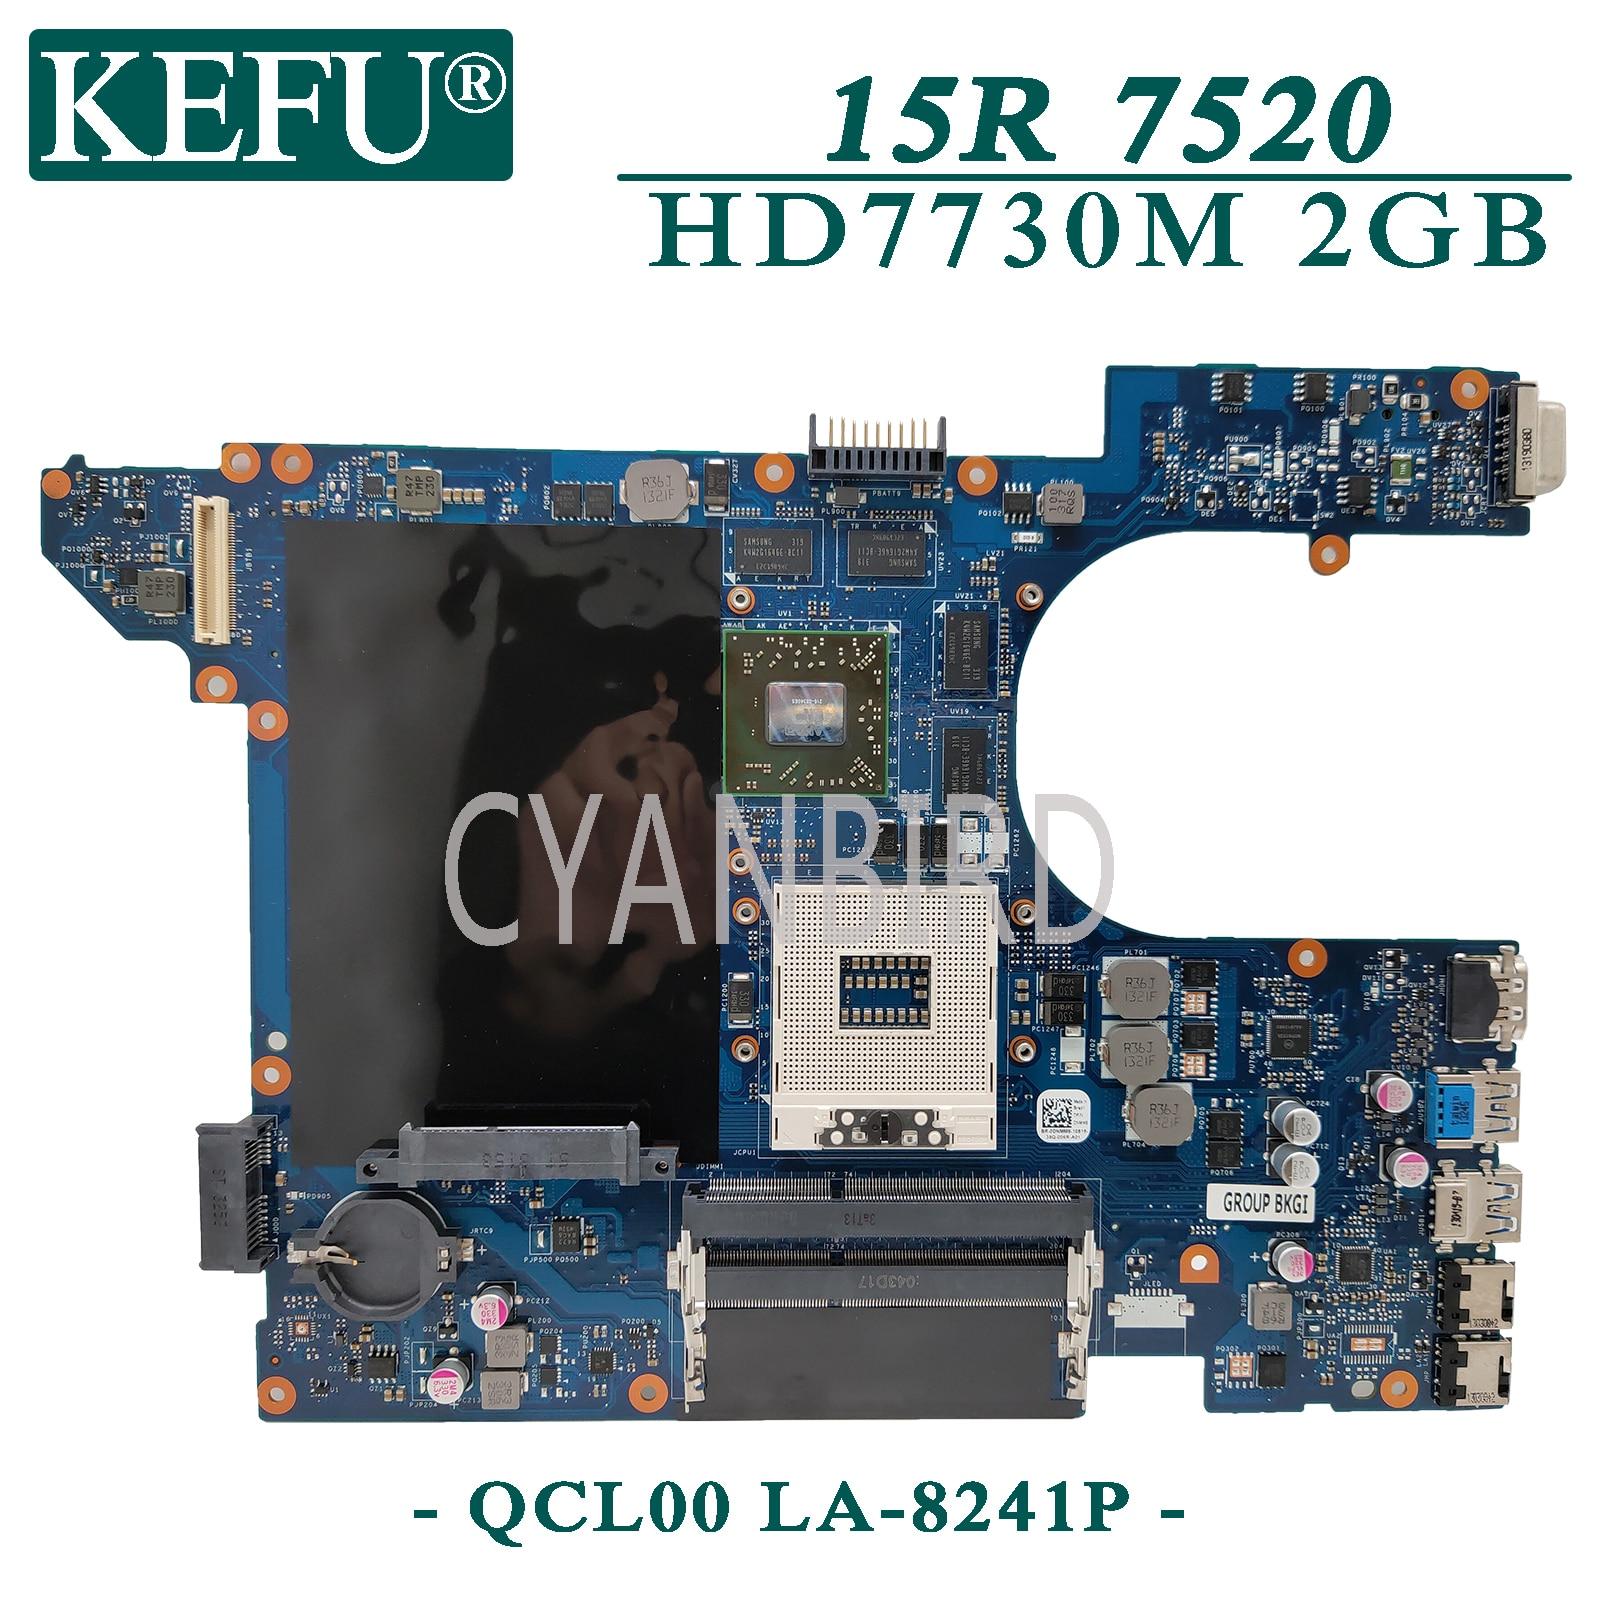 KEFU LA-8241P original mainboard for Dell Inspiron 15R-7520 5520 with HD7730M-2GB Laptop motherboard